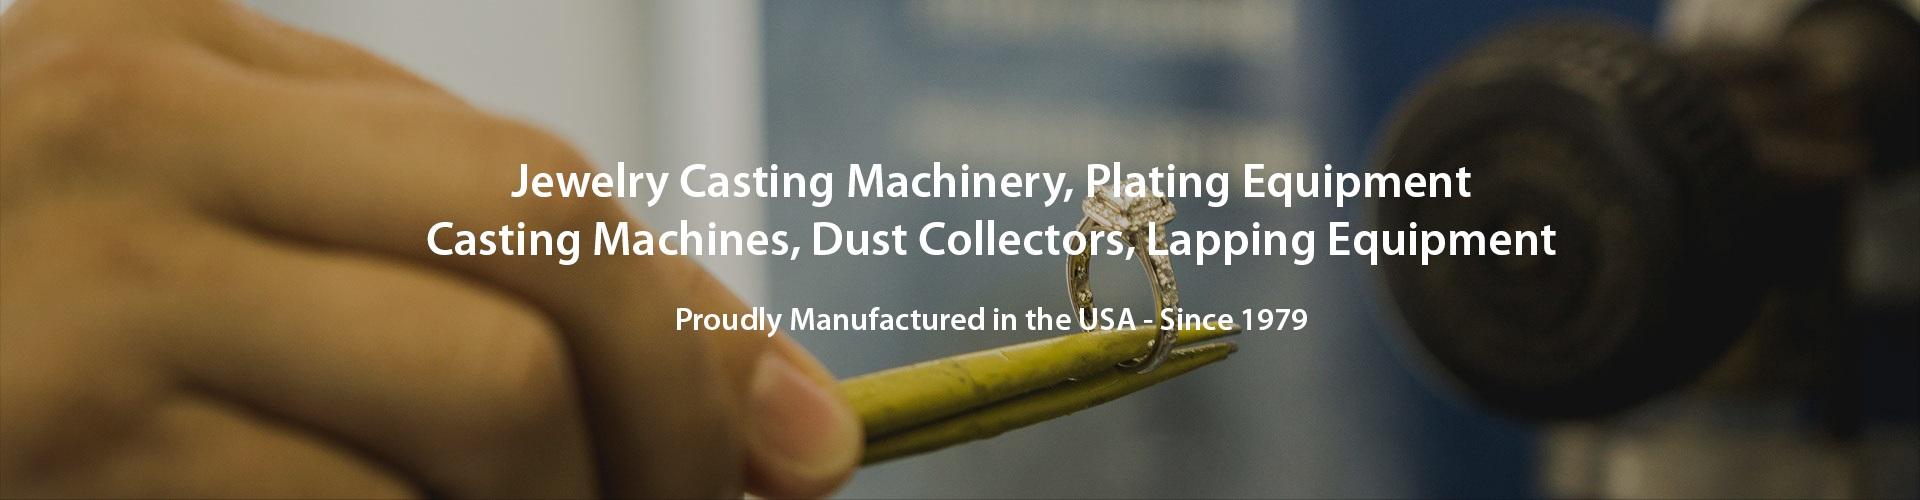 Jewelry Casting Machinery | Plating Equipment | Casting